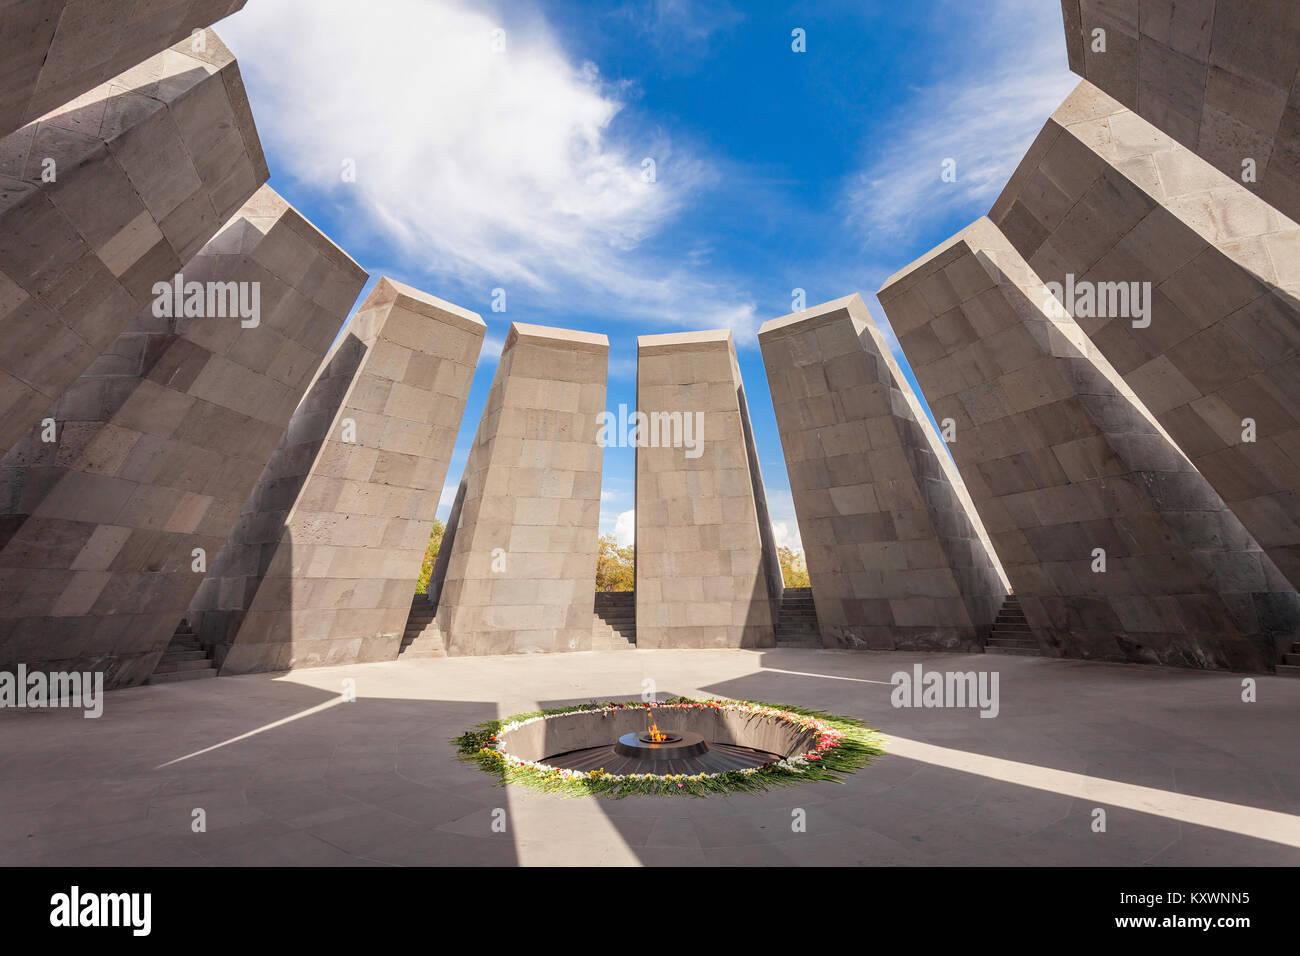 YEREVAN, ARMENIA - SEPTEMBER 29, 2015: Inside Tsitsernakaberd - The Armenian Genocide memorial complex, it is Armenia - Stock Image